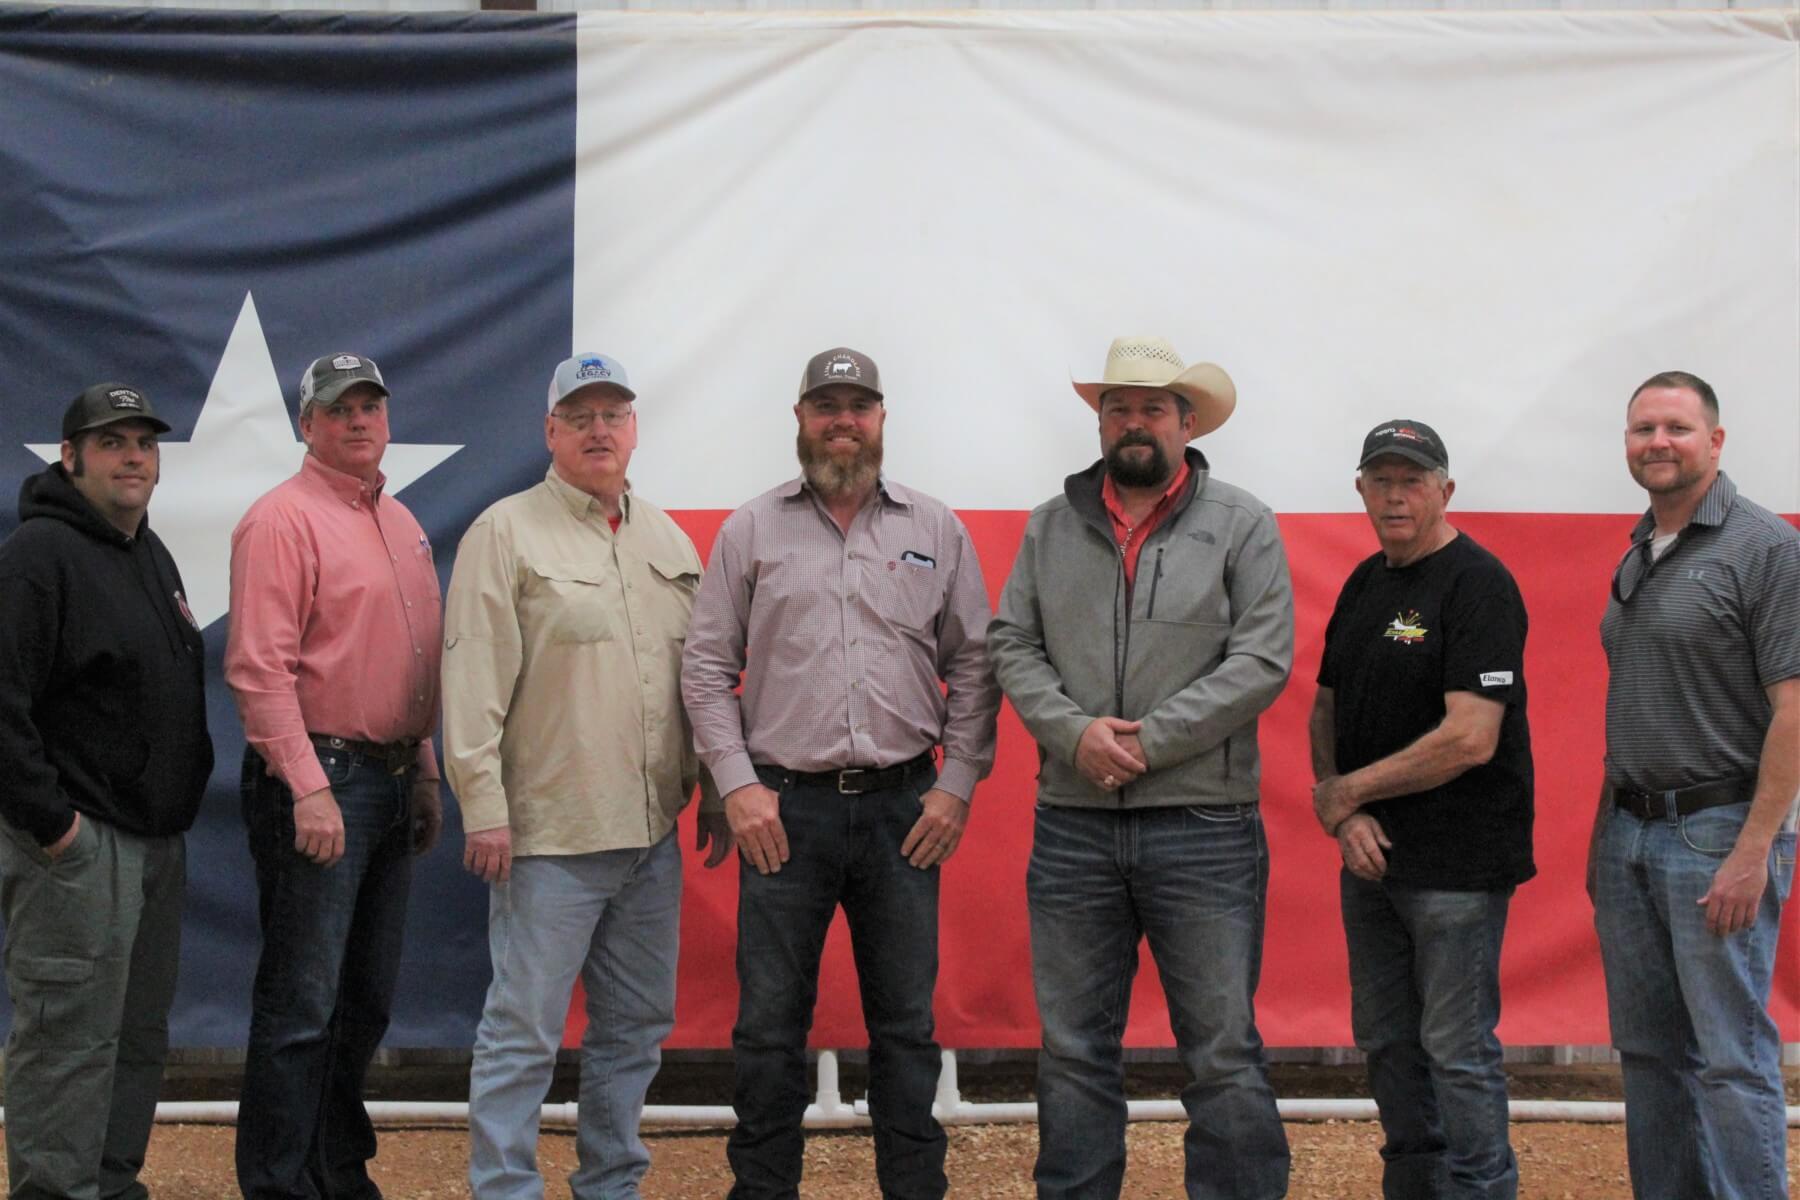 Left to Right: Matthew Mitchell, Eric Dennis, Larry Ludeke, Chris Link, Josh Owens, Gary Biggs, and David Skeans